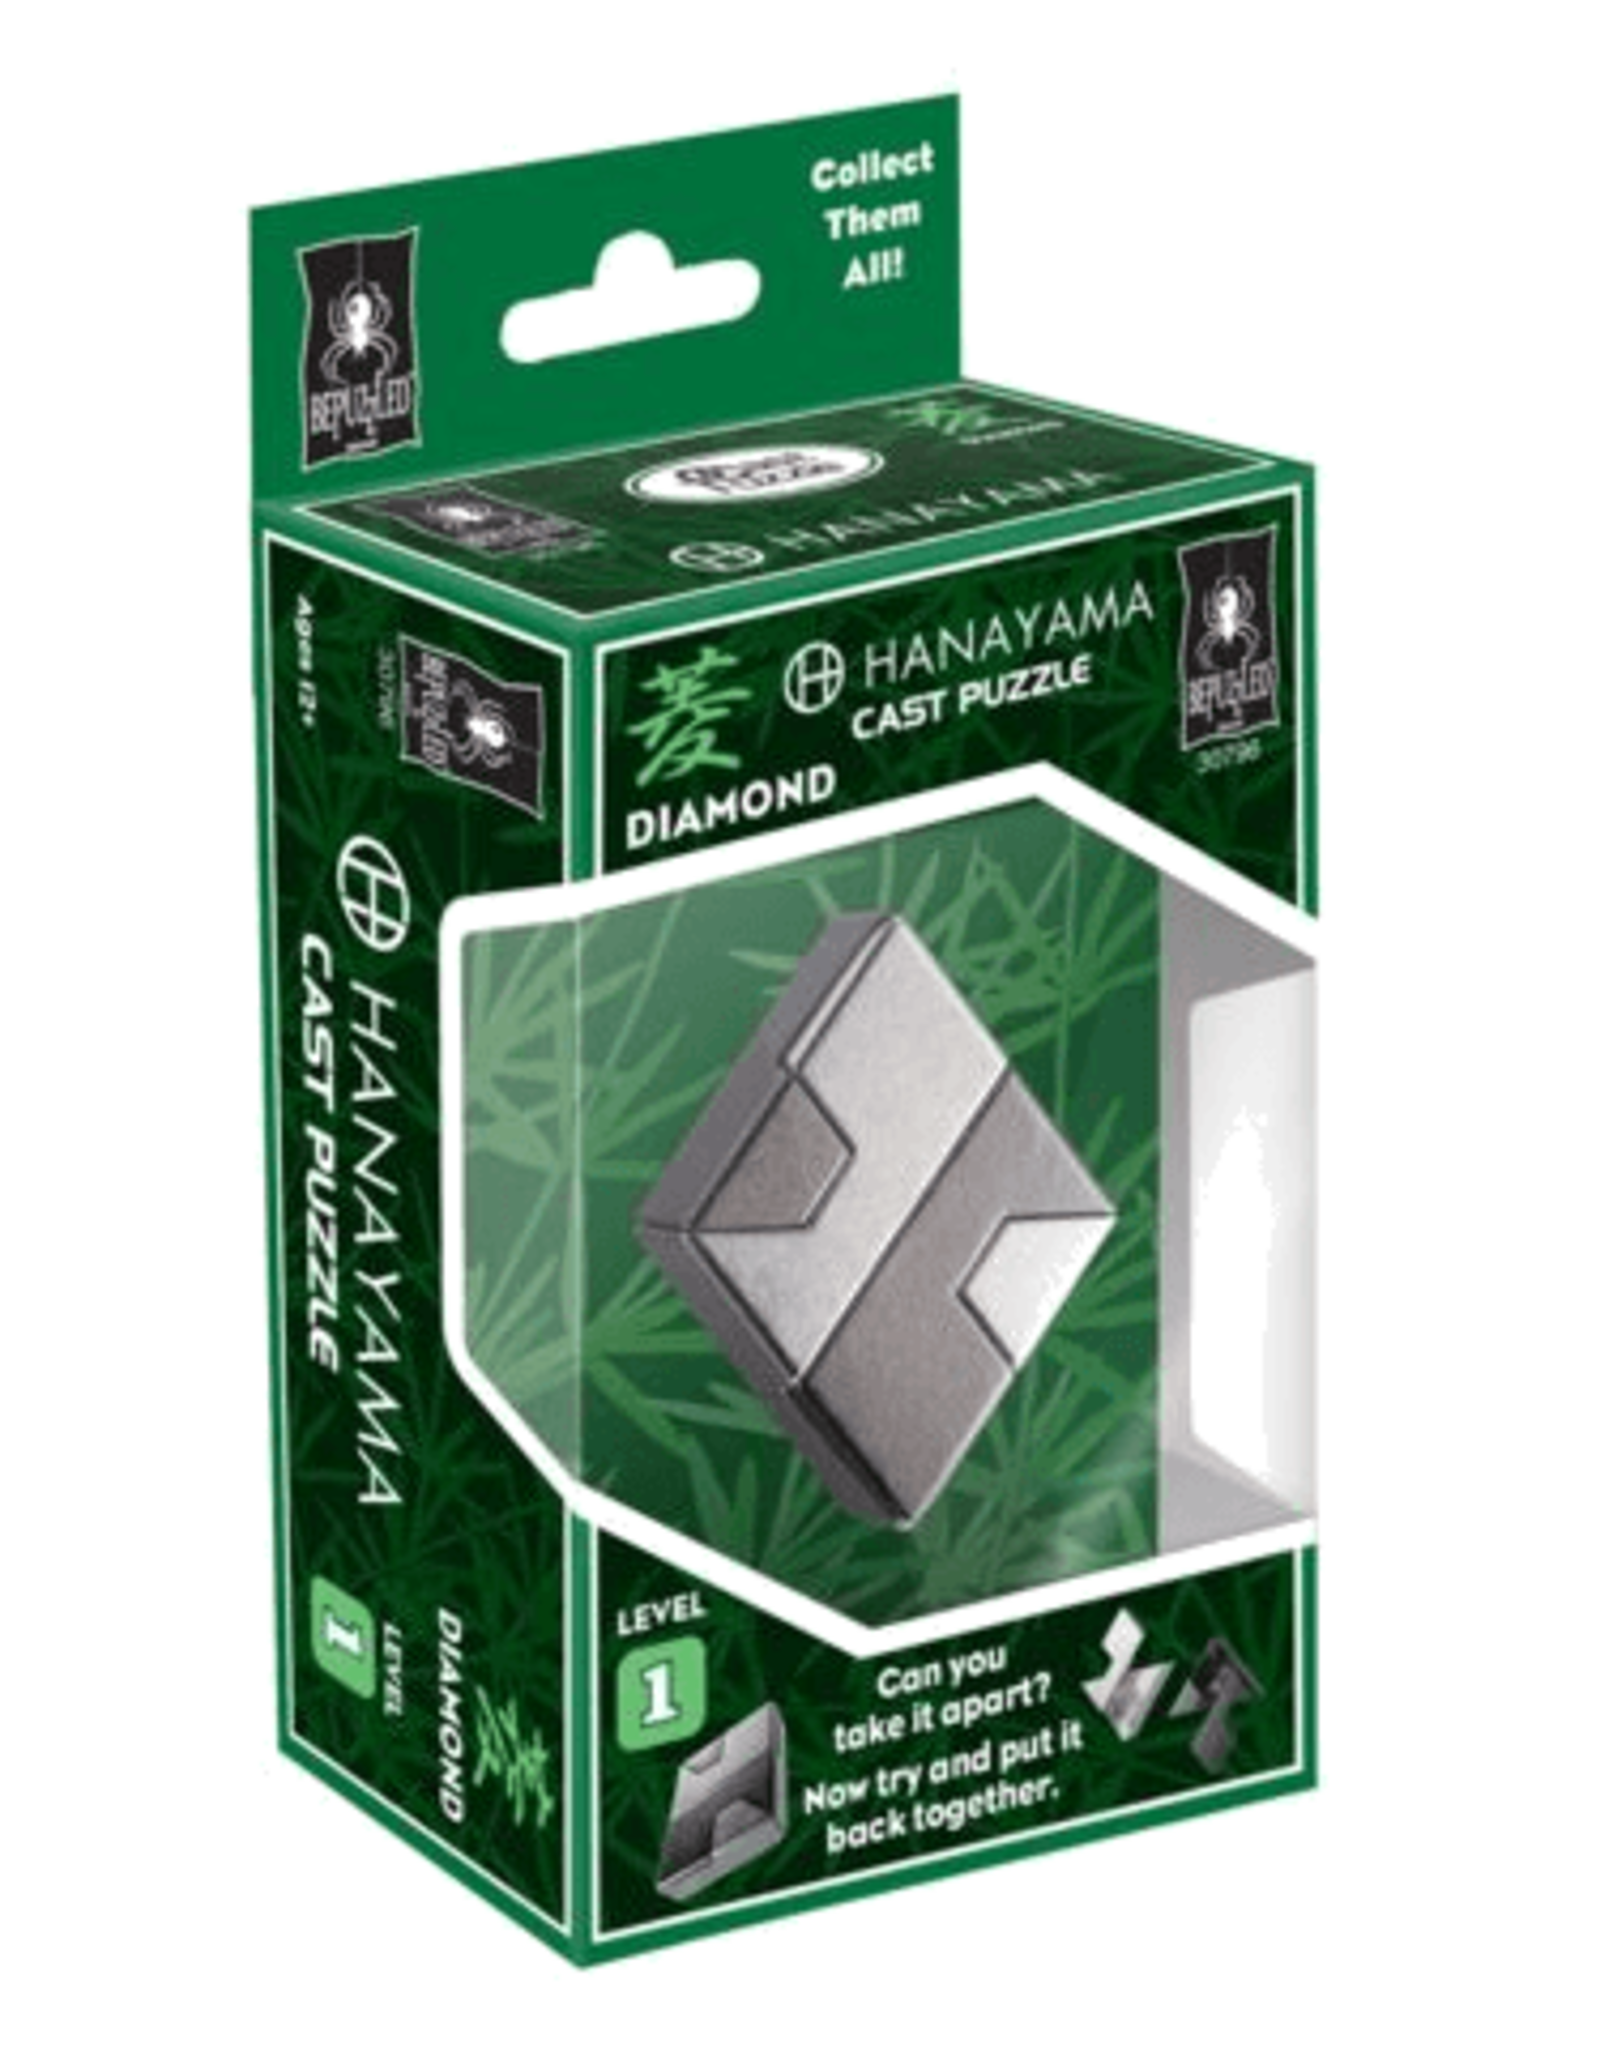 Hanayama Lvl 1 Diamond